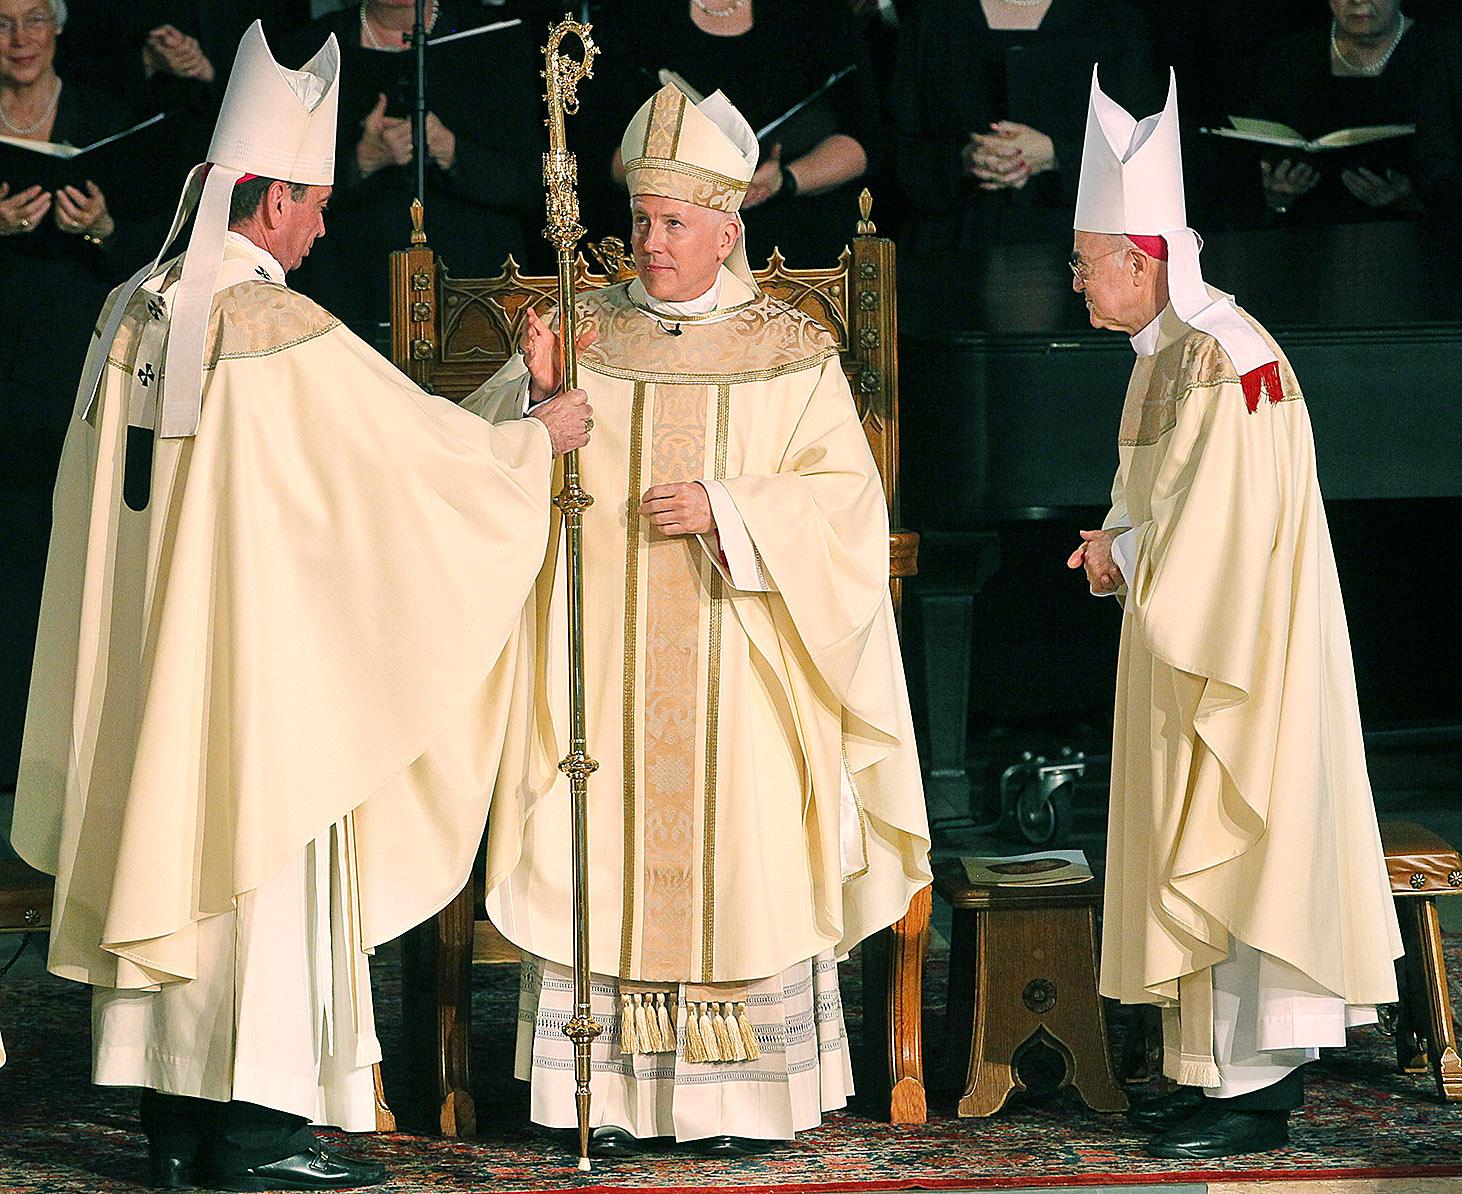 Church luminaries drawn to greet 8th toledo bishop the blade kristyandbryce Image collections